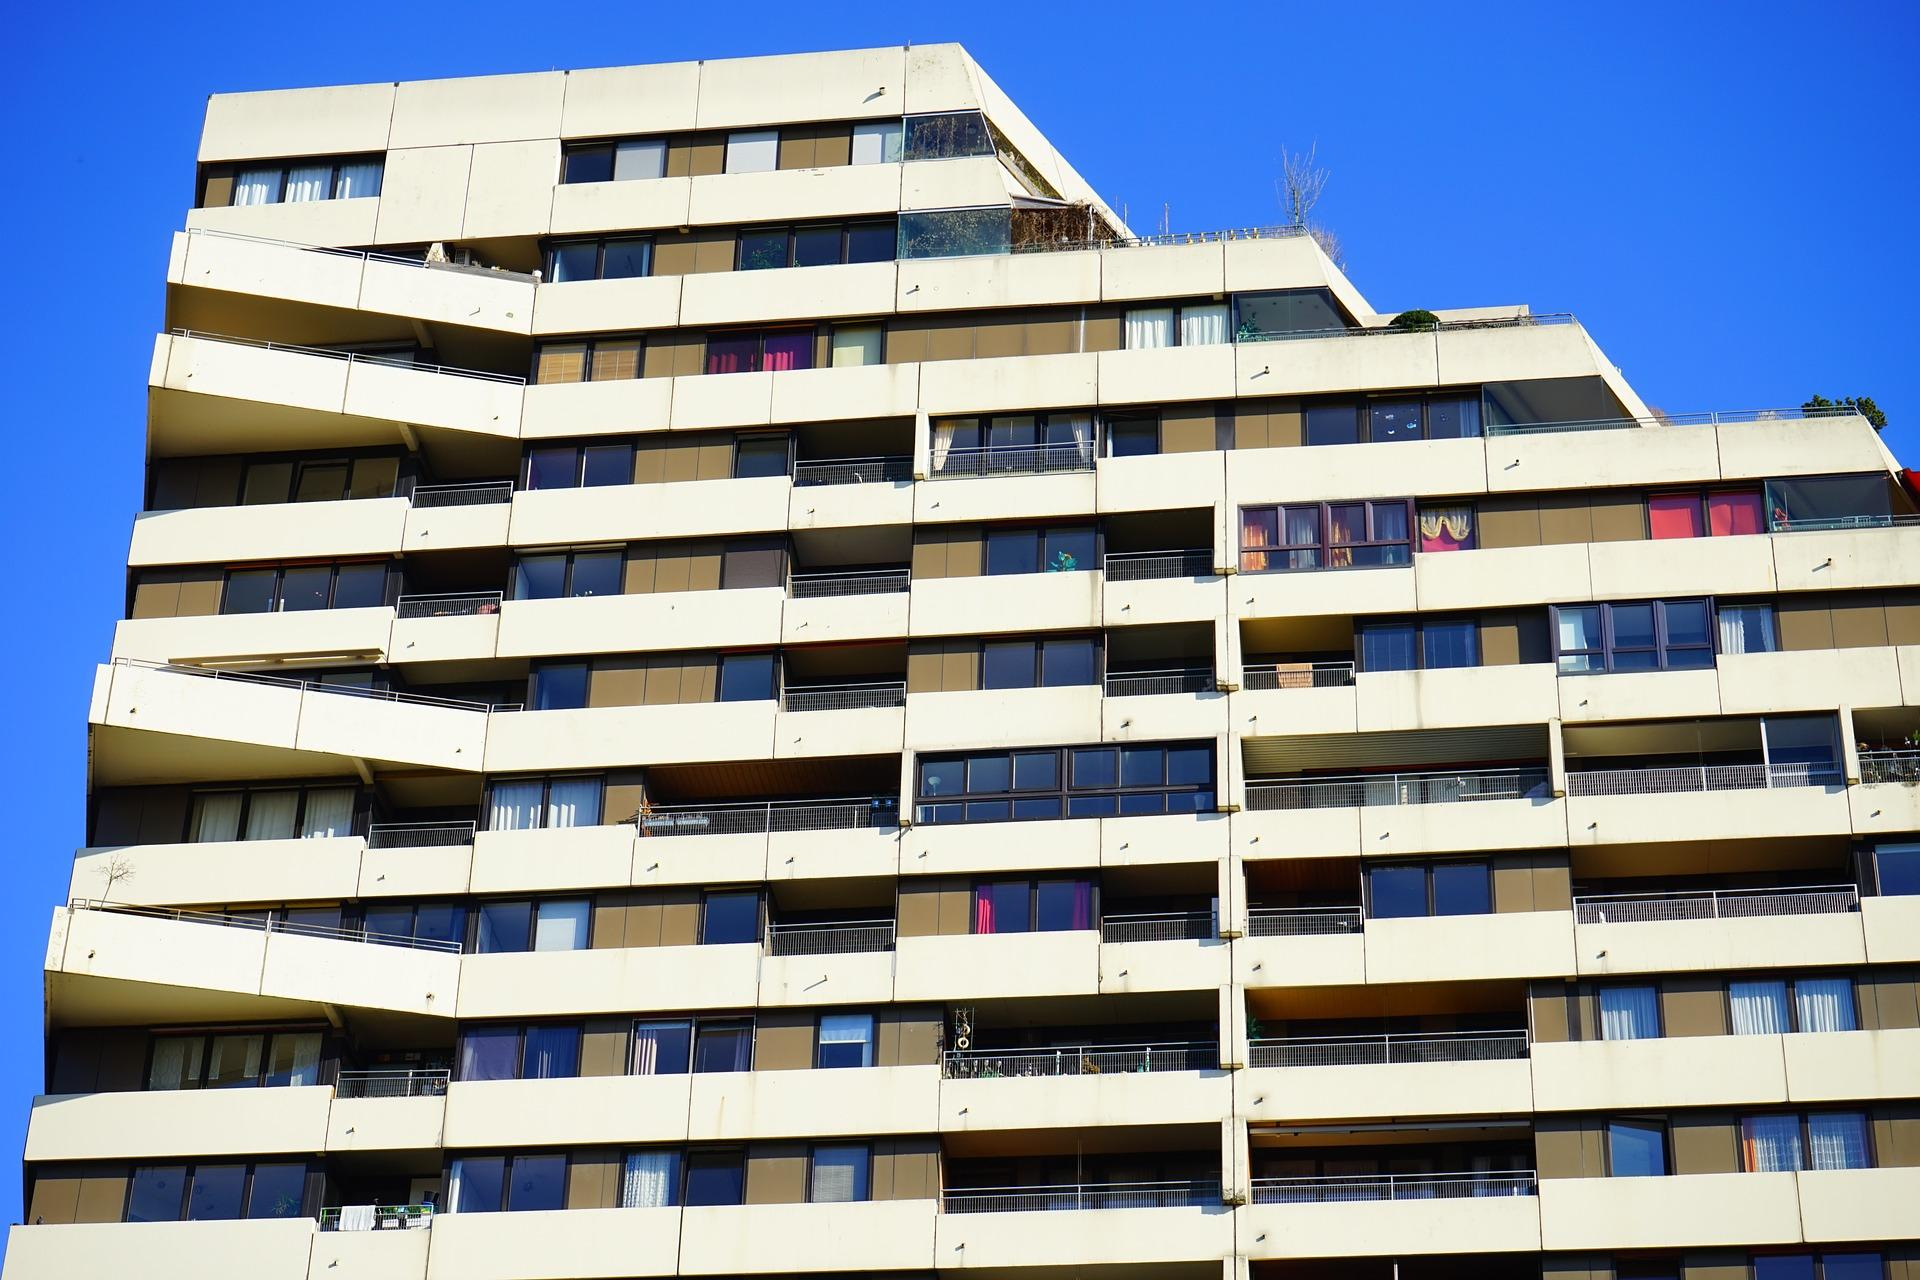 social housing apartments